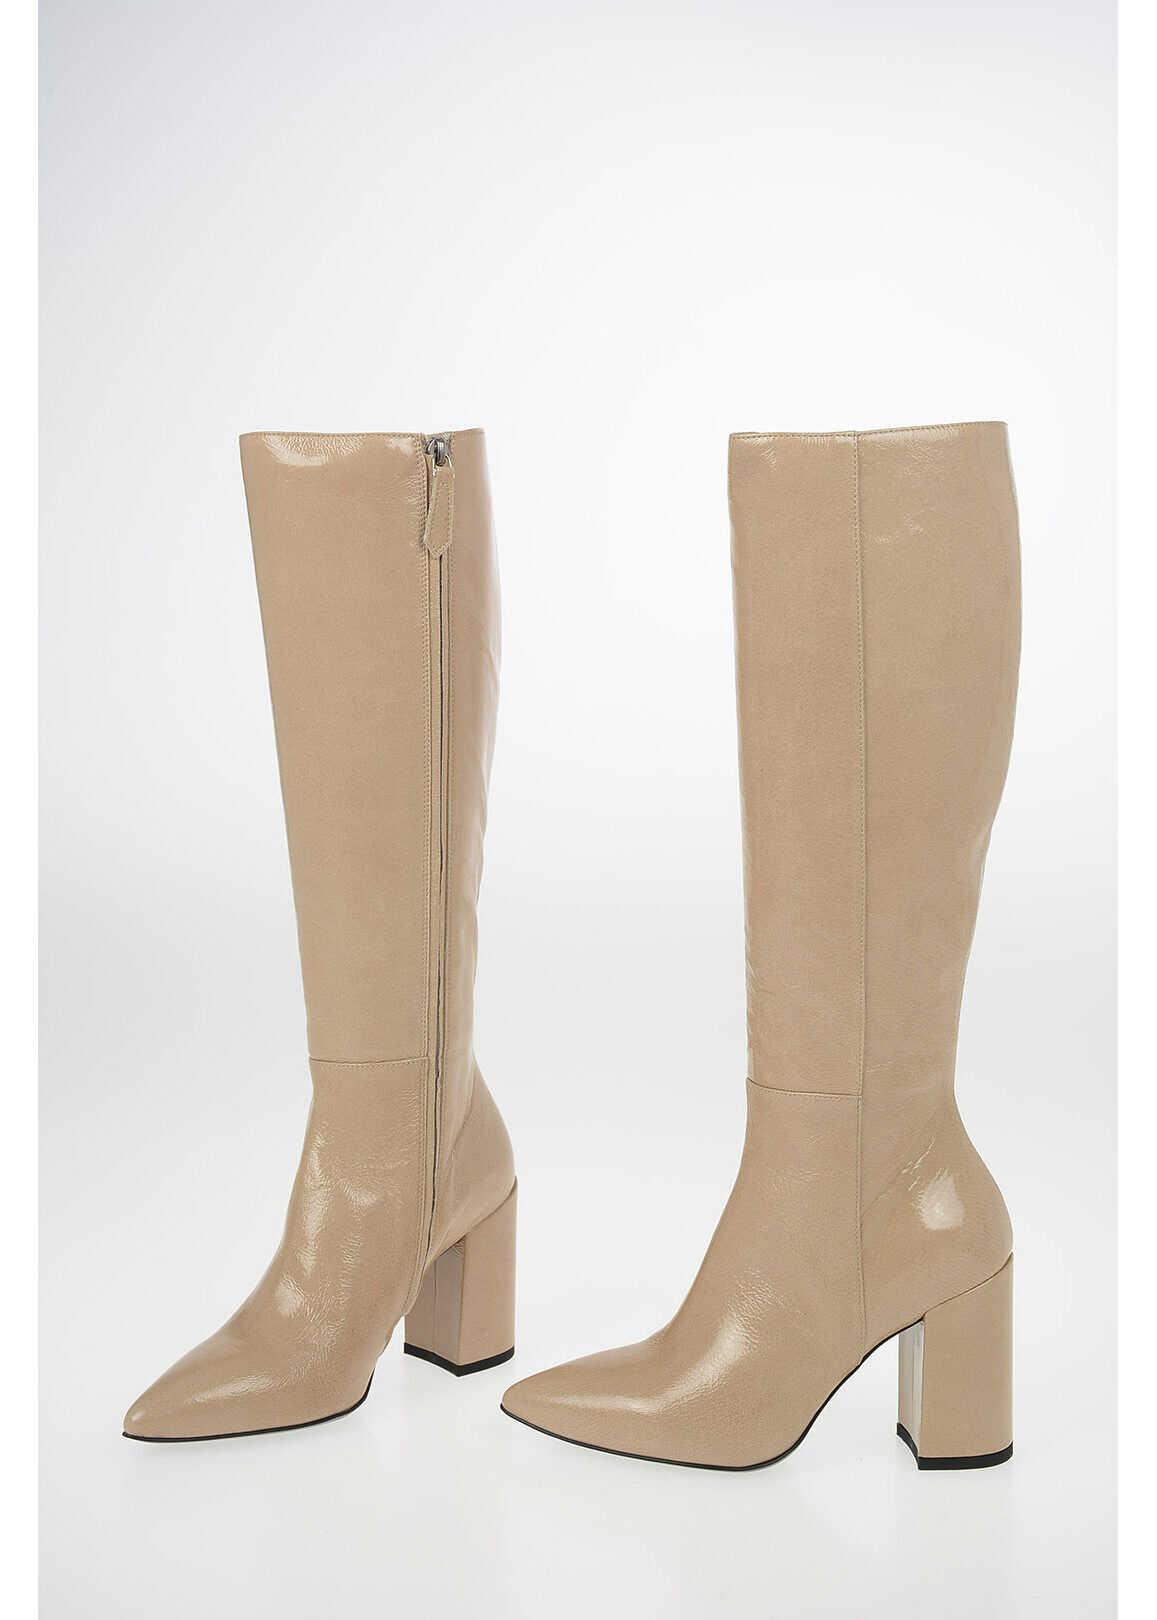 DROME Leather Boots 10cm BEIGE imagine b-mall.ro